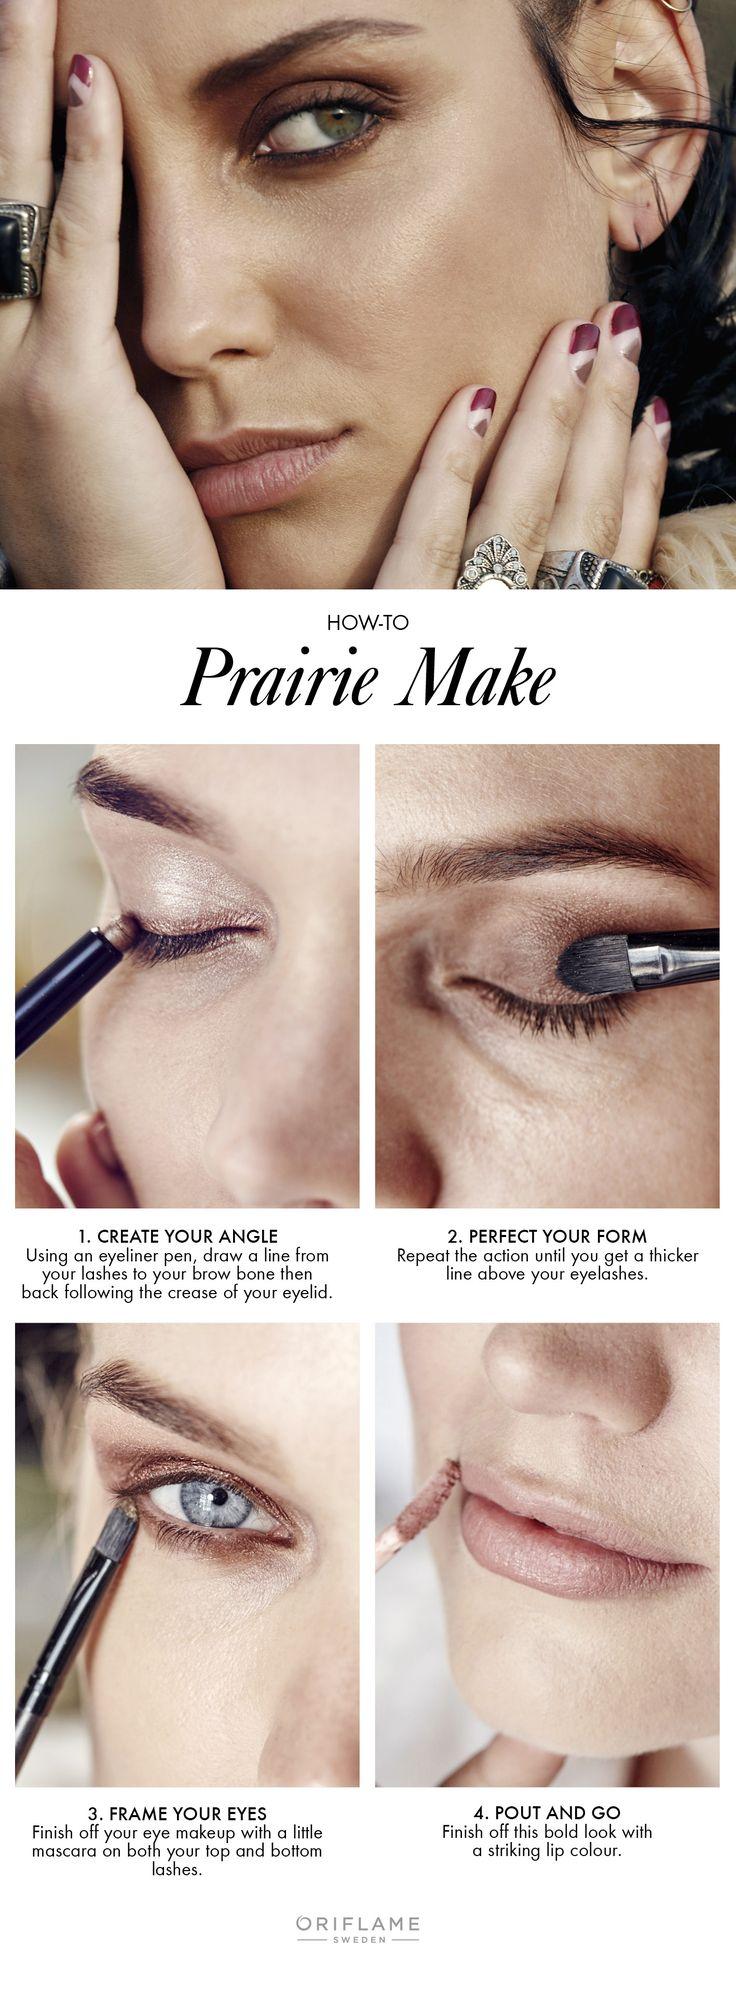 Prairie makeup look! #trend #makeup #oriflame